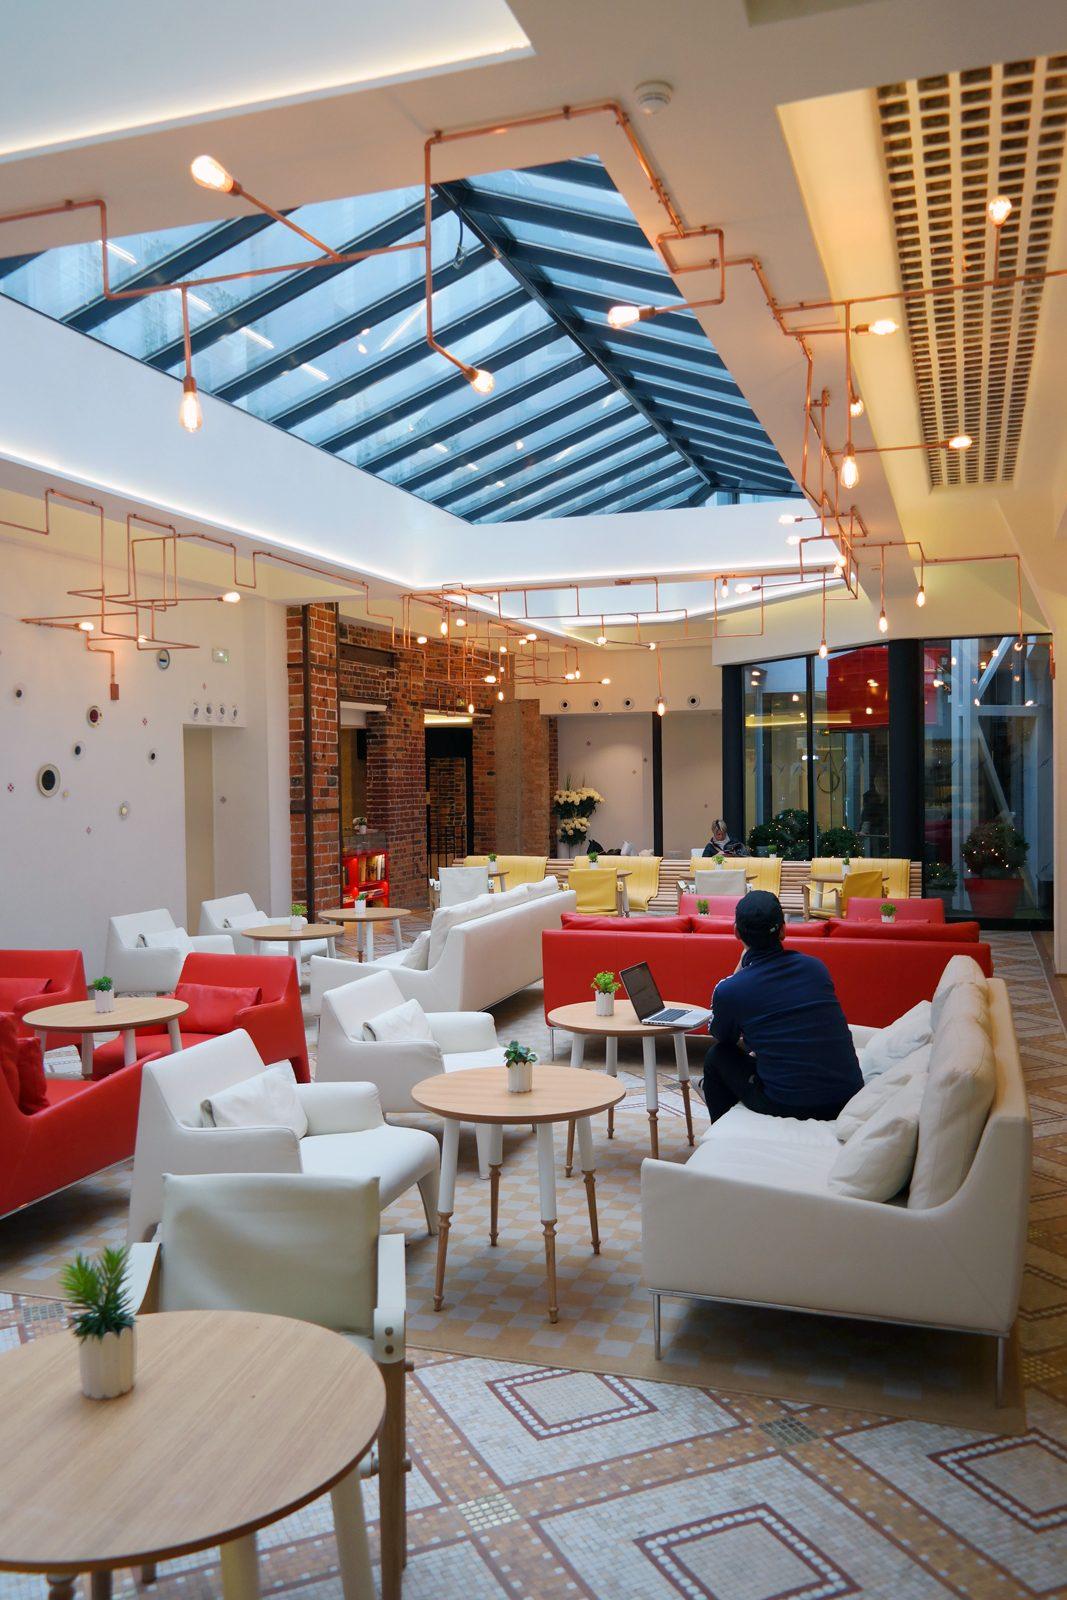 34B Hotel astotel paris 34 rue Bergere lobby breakfast french design booking photo usofparis blog